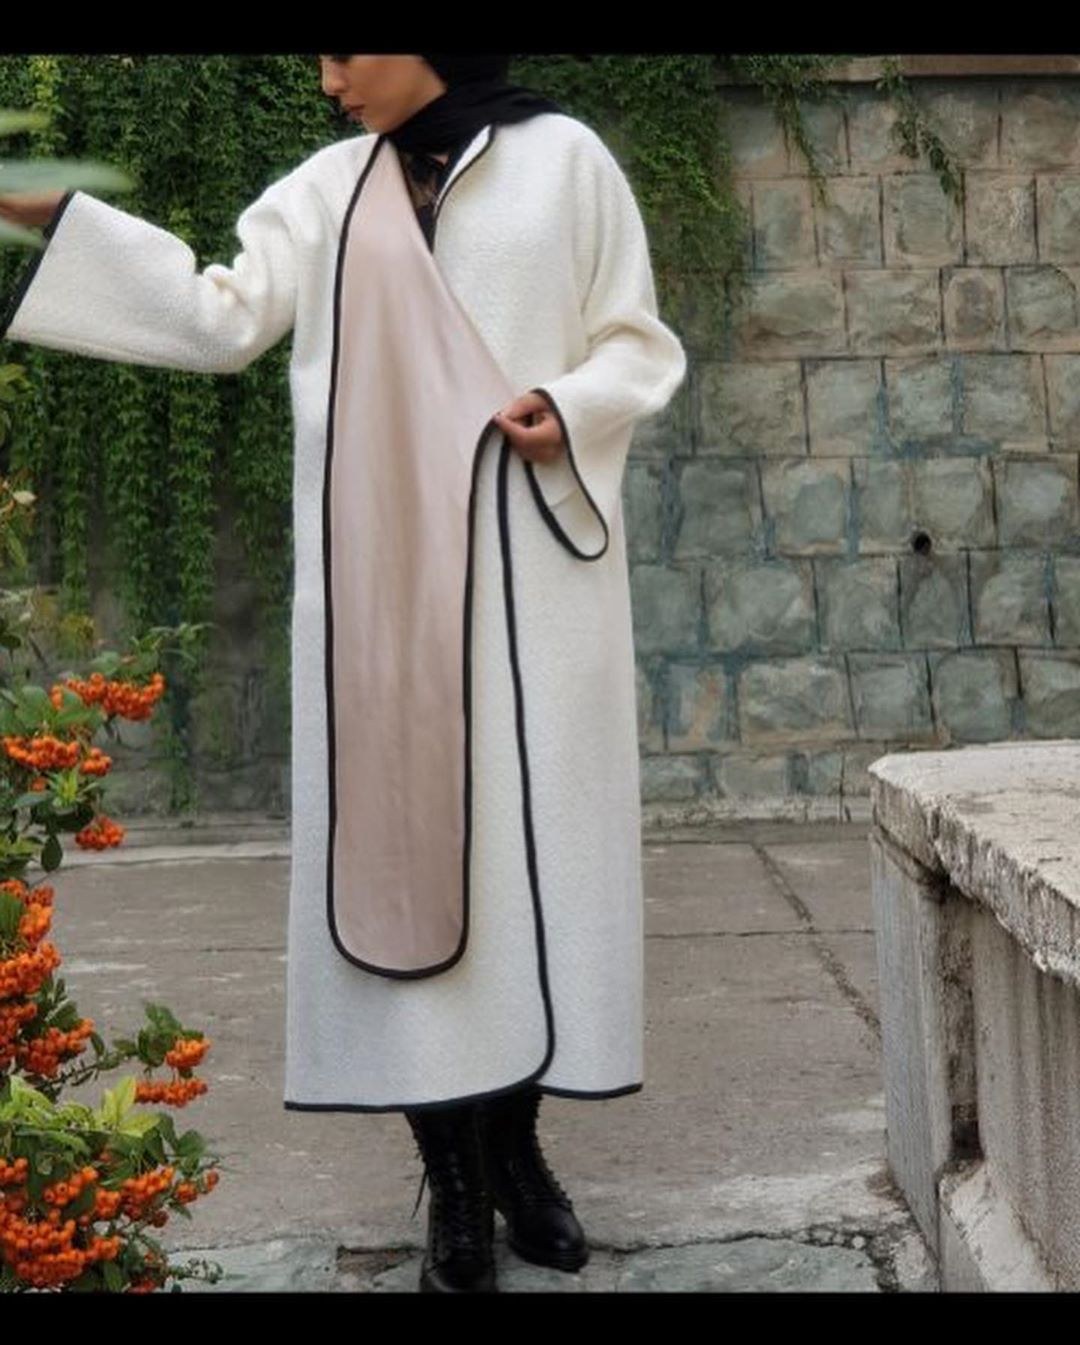 مدل پالتو بلند زنانه جلوباز